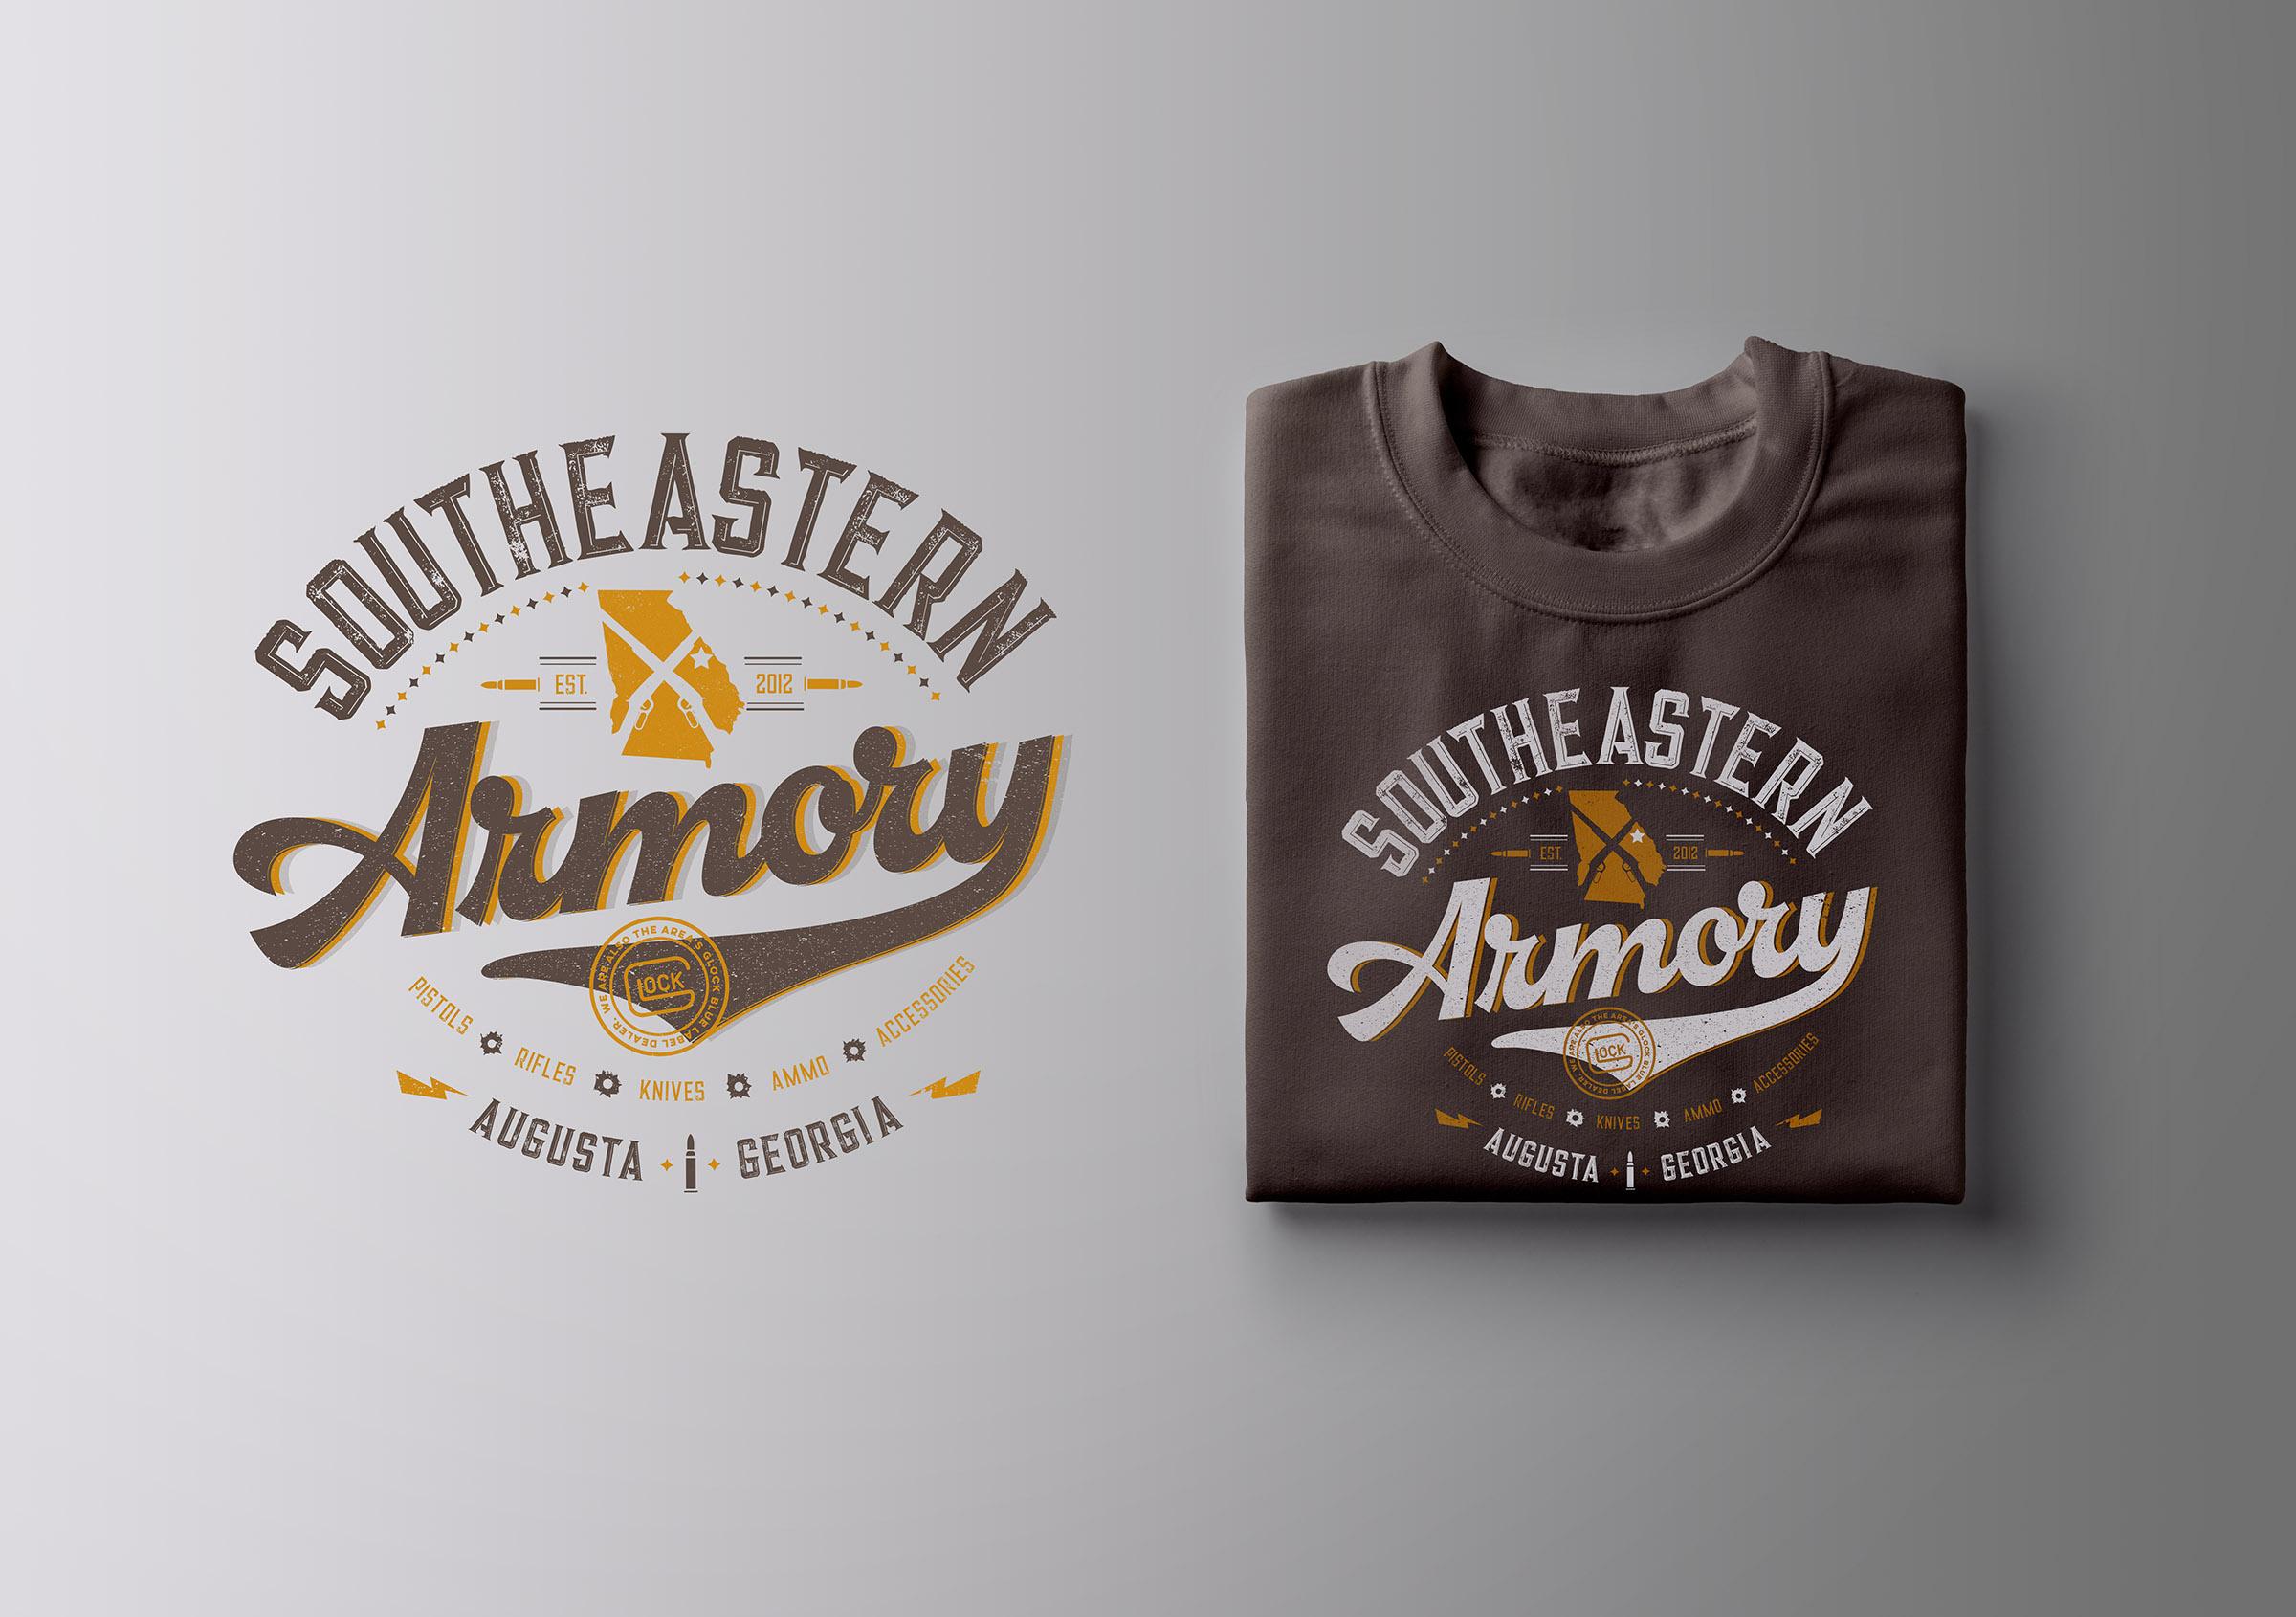 Southeastern Armory T-Shirt